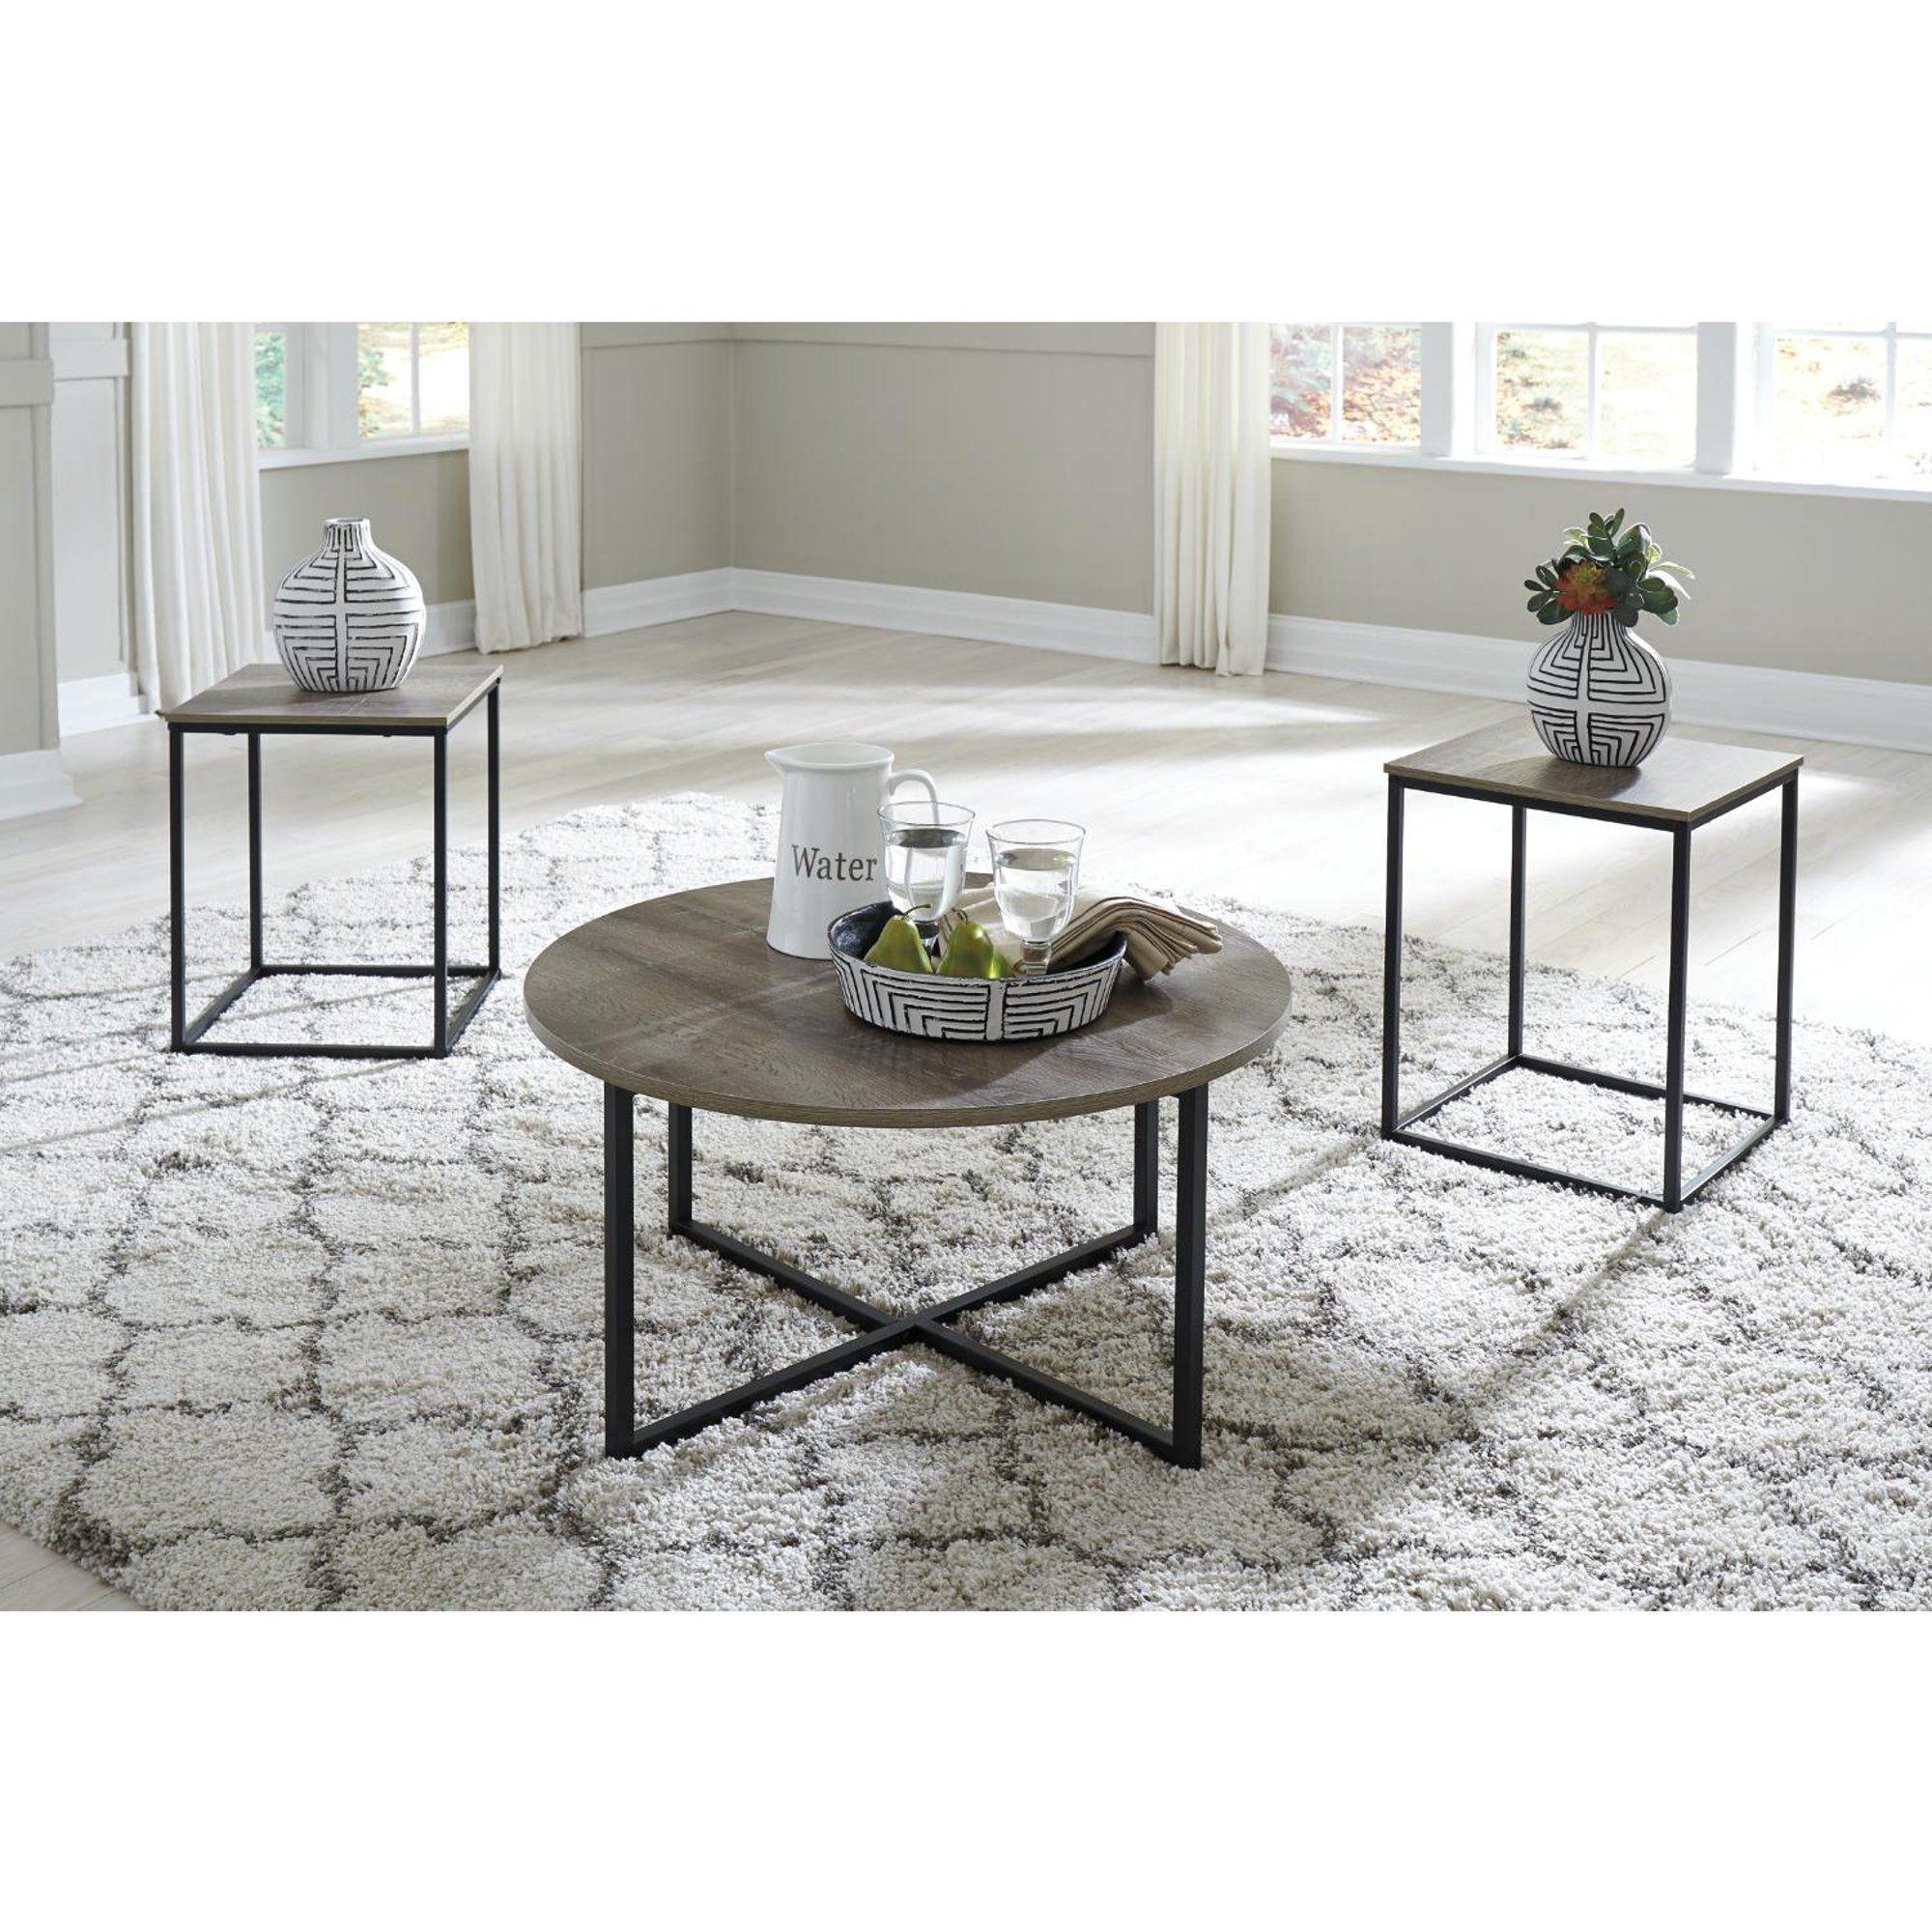 Signature Design By Ashley Wadeworth Living Room Table Set Walmart Com Living Room Table Sets Coffee Table Living Room Table [ 2000 x 2000 Pixel ]